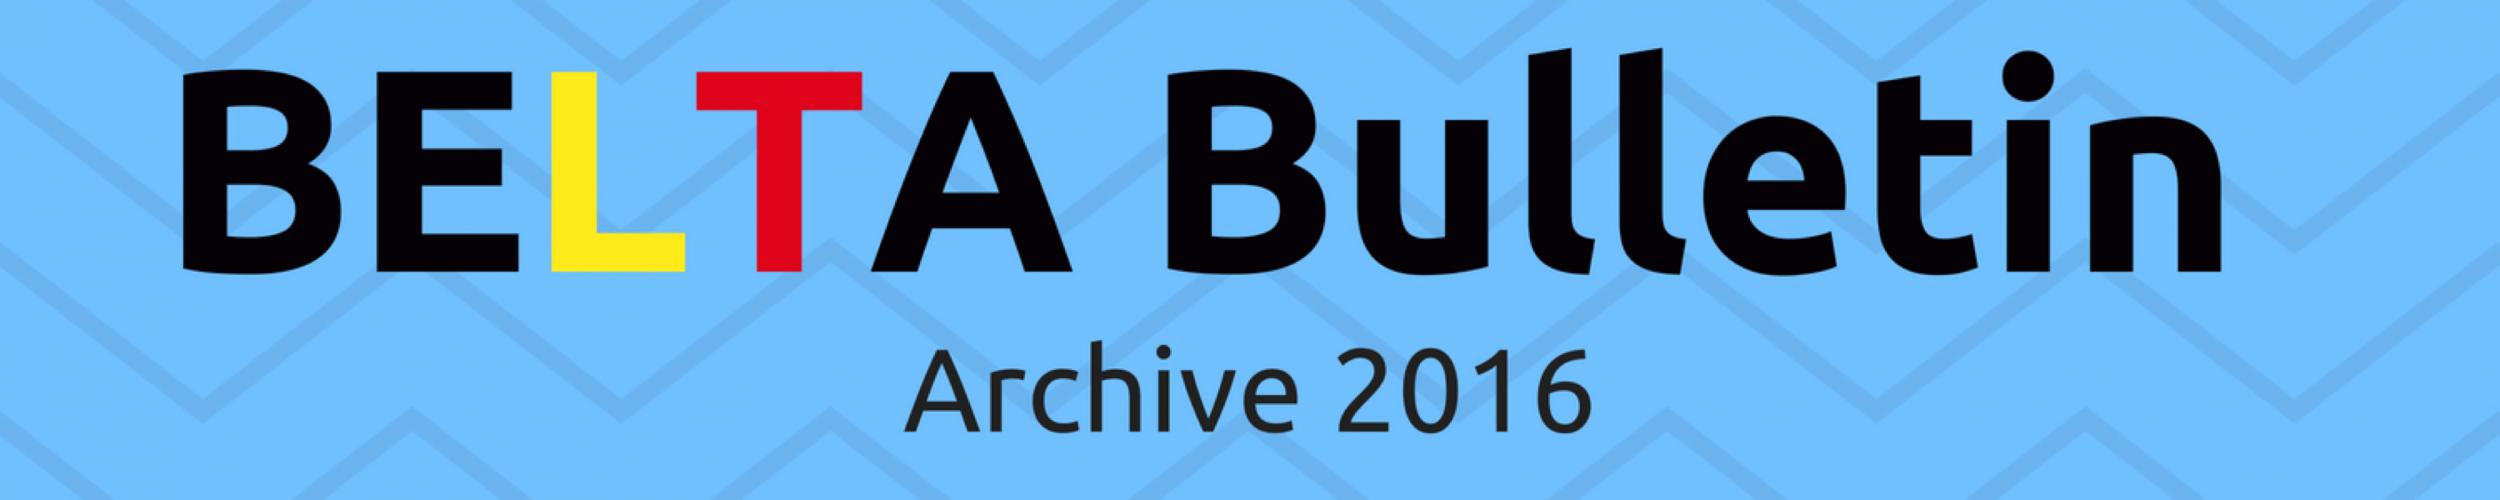 BULLETIN Archive 2016